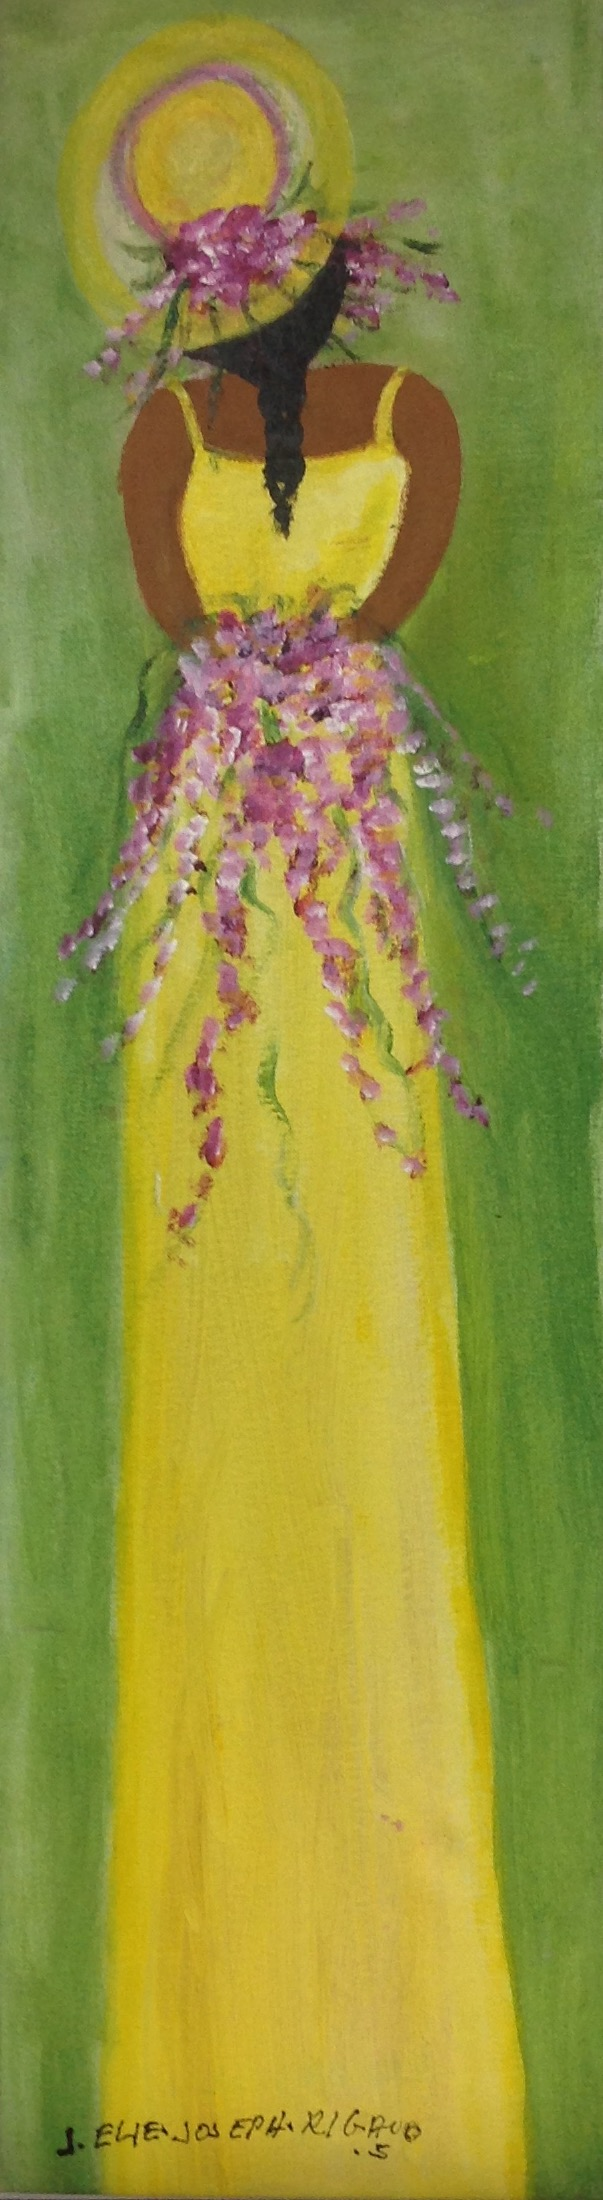 Rigaud Joseph Elie 33X9 #1-1-12 canvas 2005